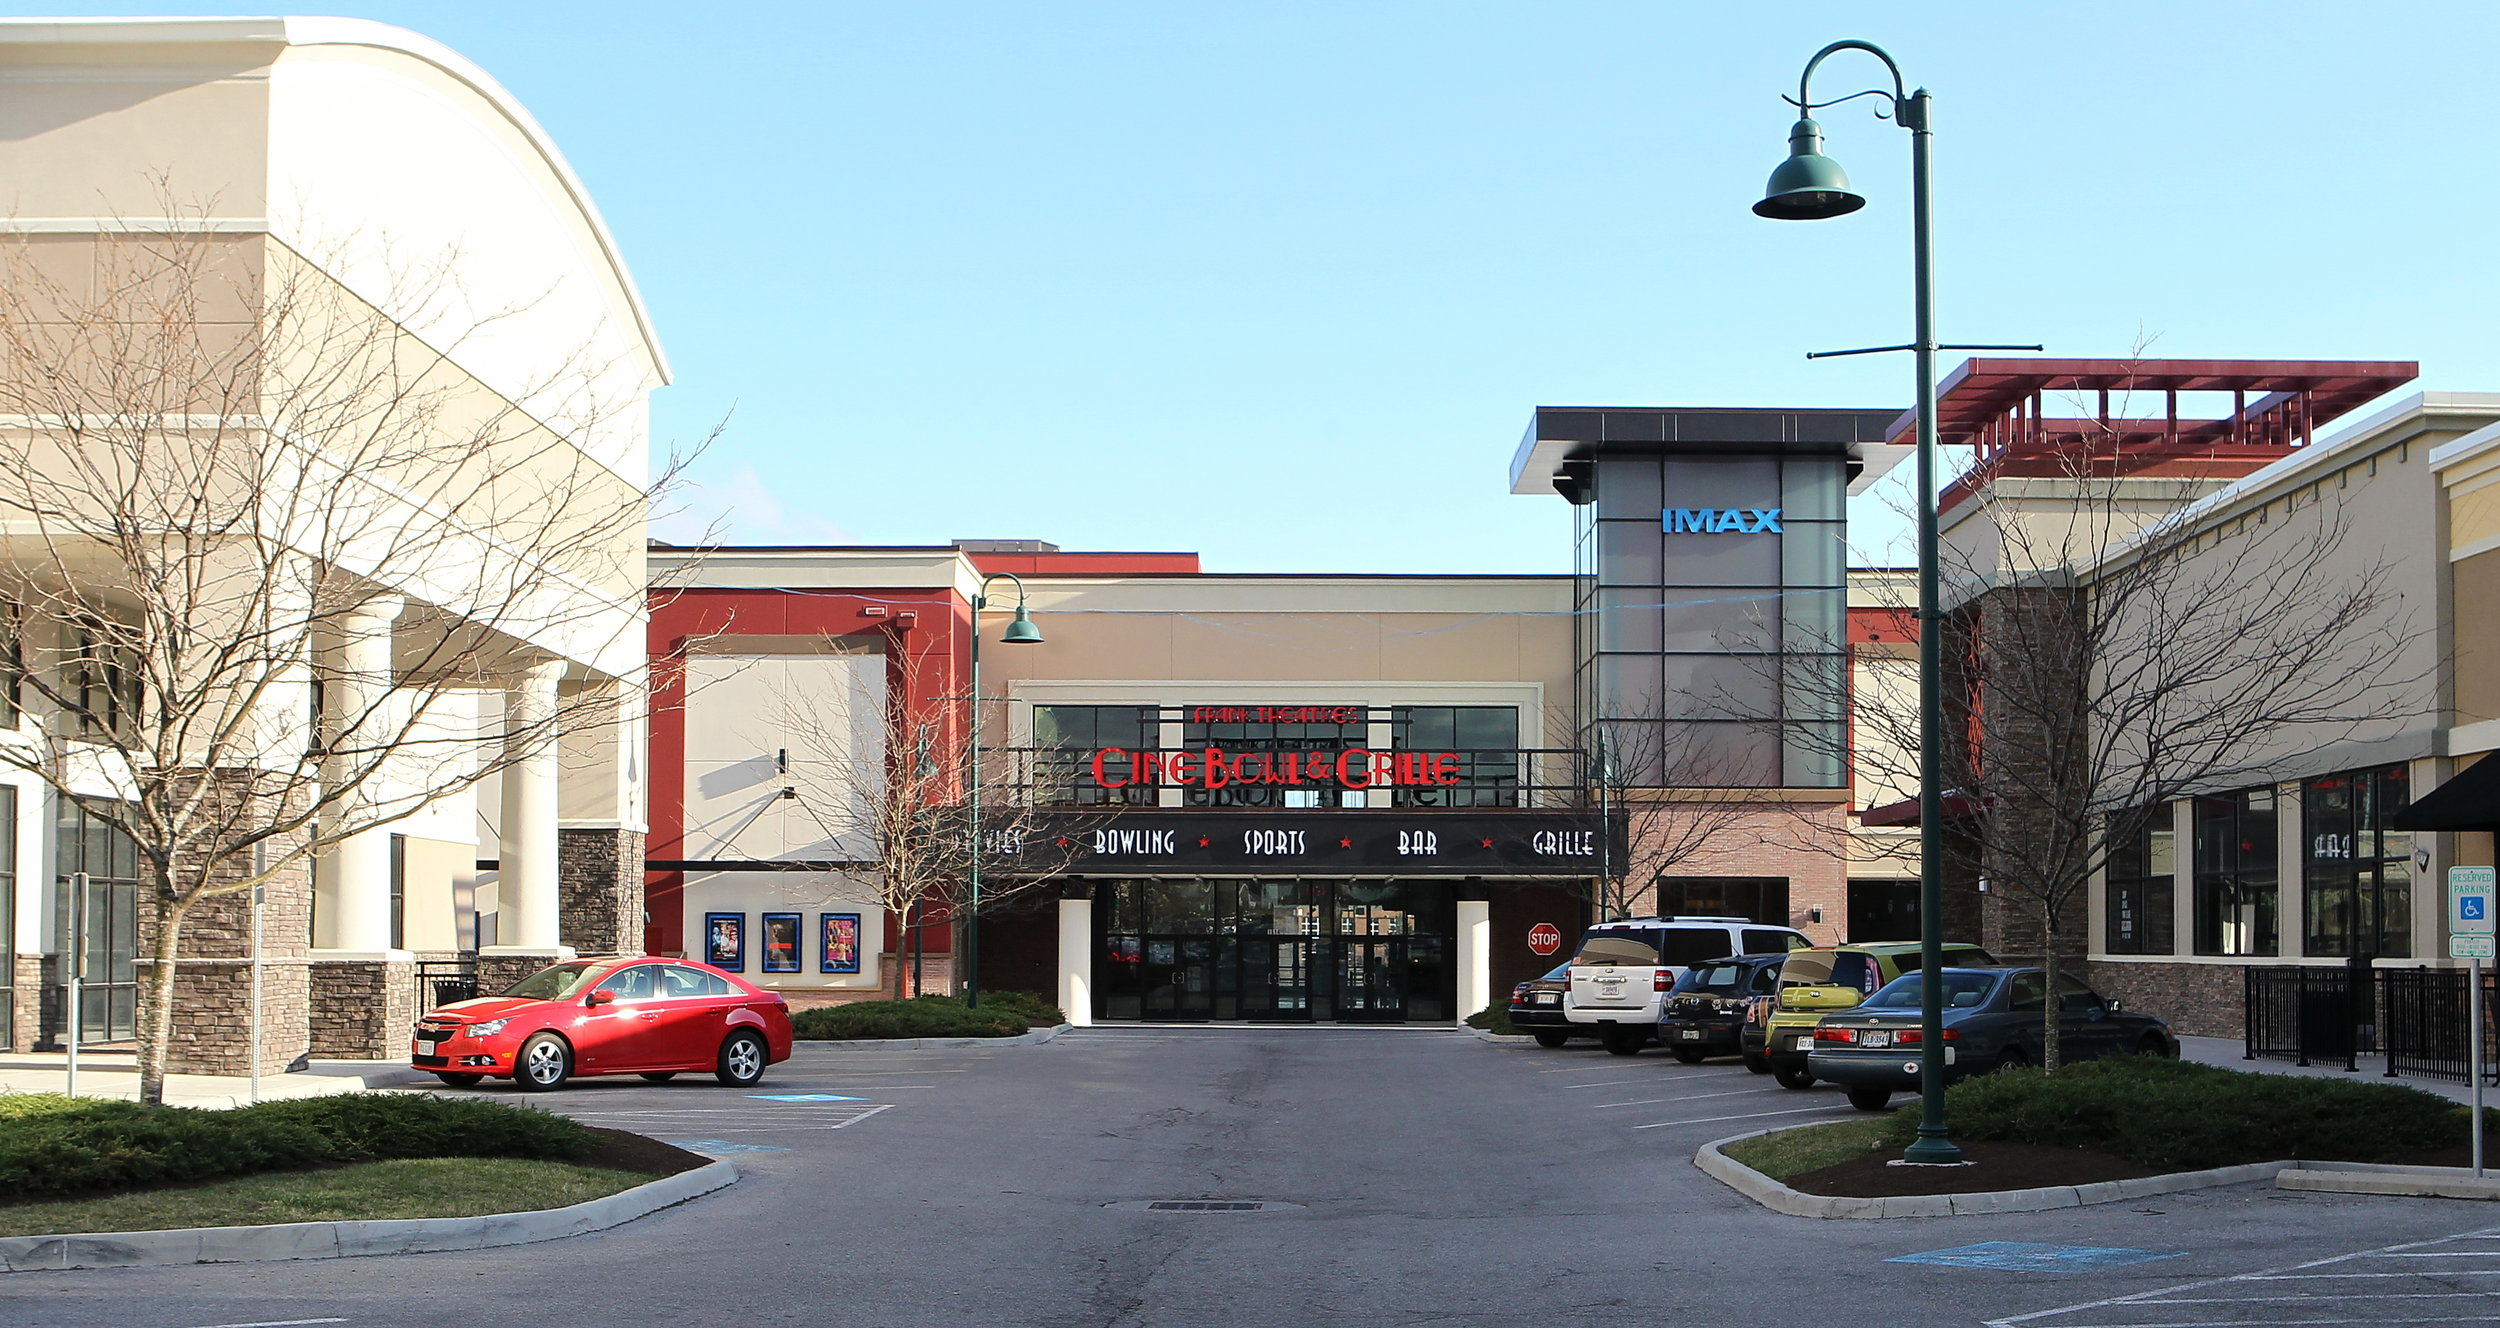 ADW-Entertainment-CineBowl-Grille-Blacksburg-VA-1.jpg